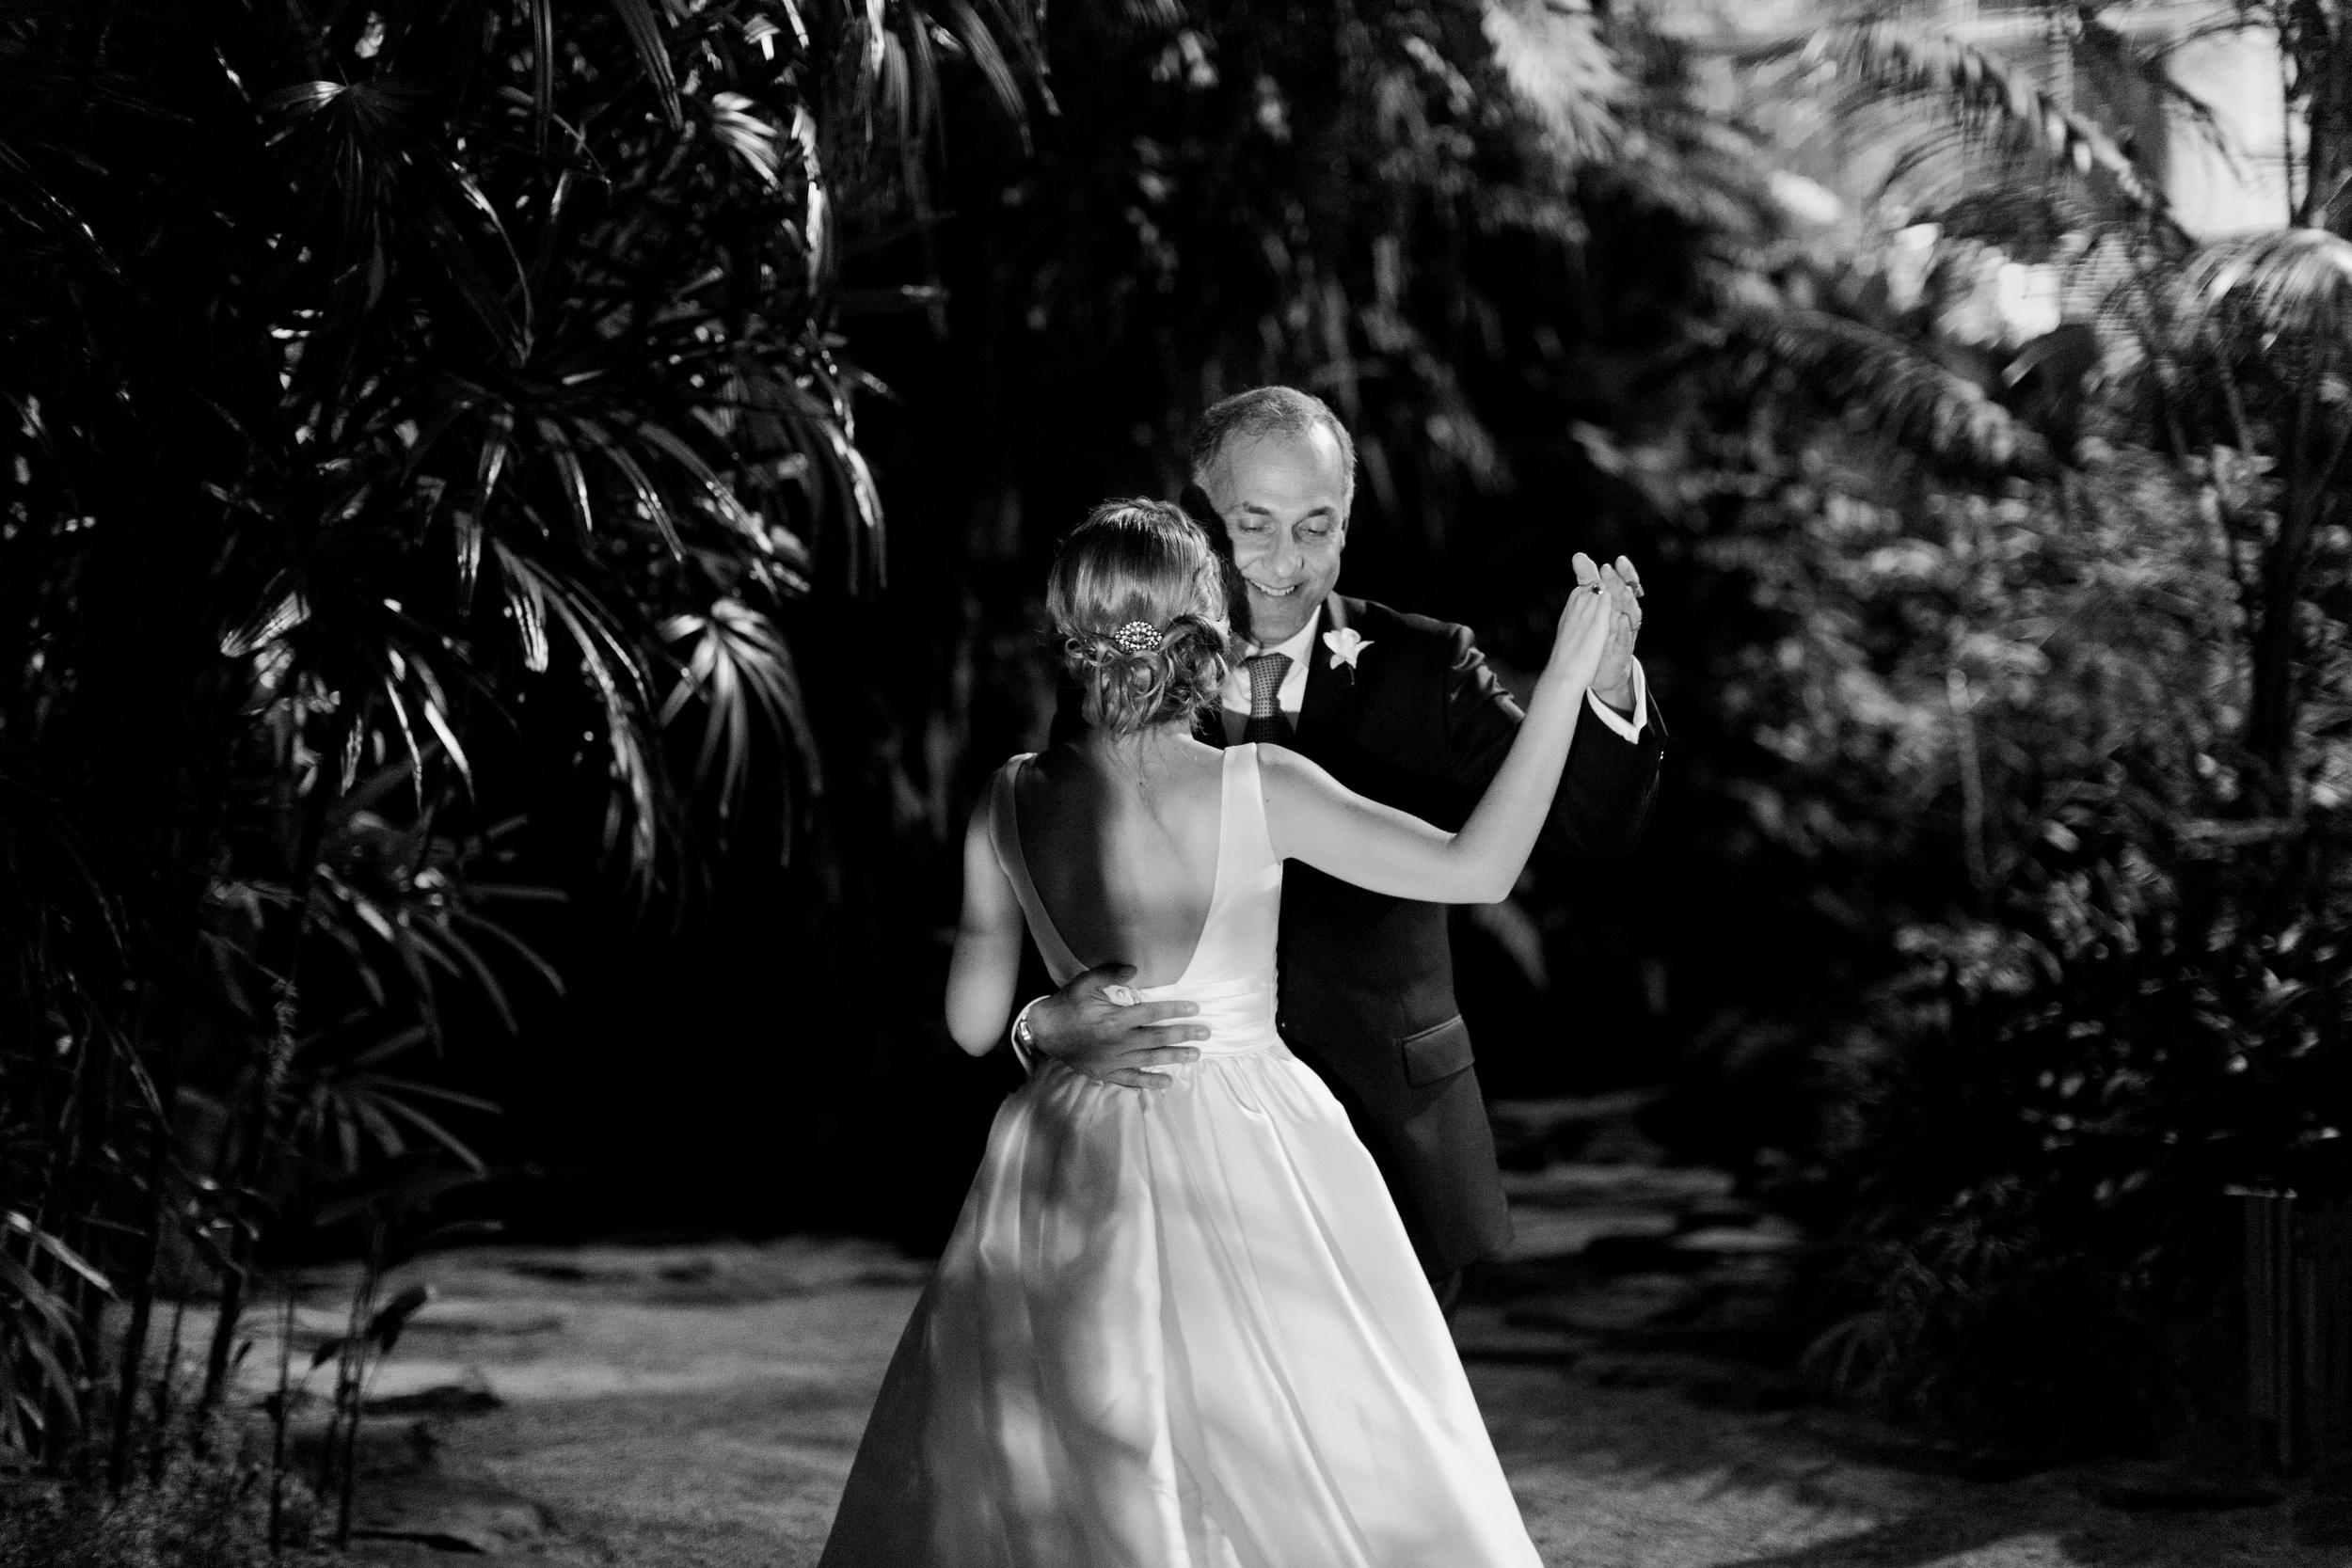 mariarao+wedding+estufa+fria-461.jpg